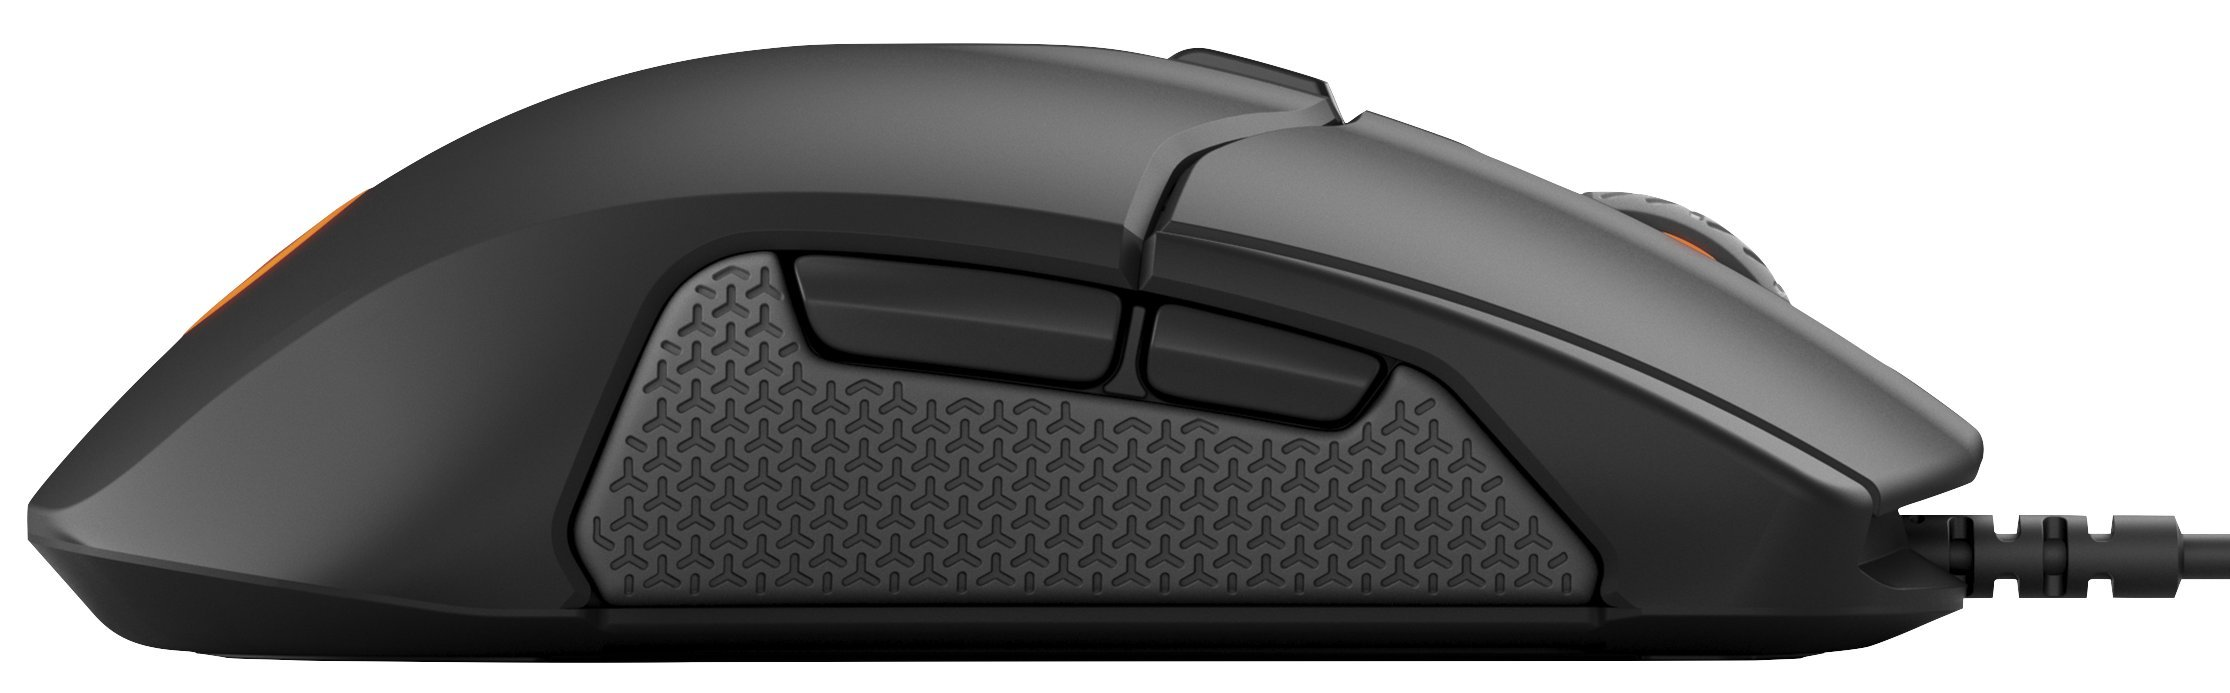 SteelSeries Sensei 310 Gaming Mouse - 12,000 CPI TrueMove3 Optical Sensor - Ambidextrous Design - Split-Trigger Buttons - RGB Lighting by SteelSeries (Image #6)